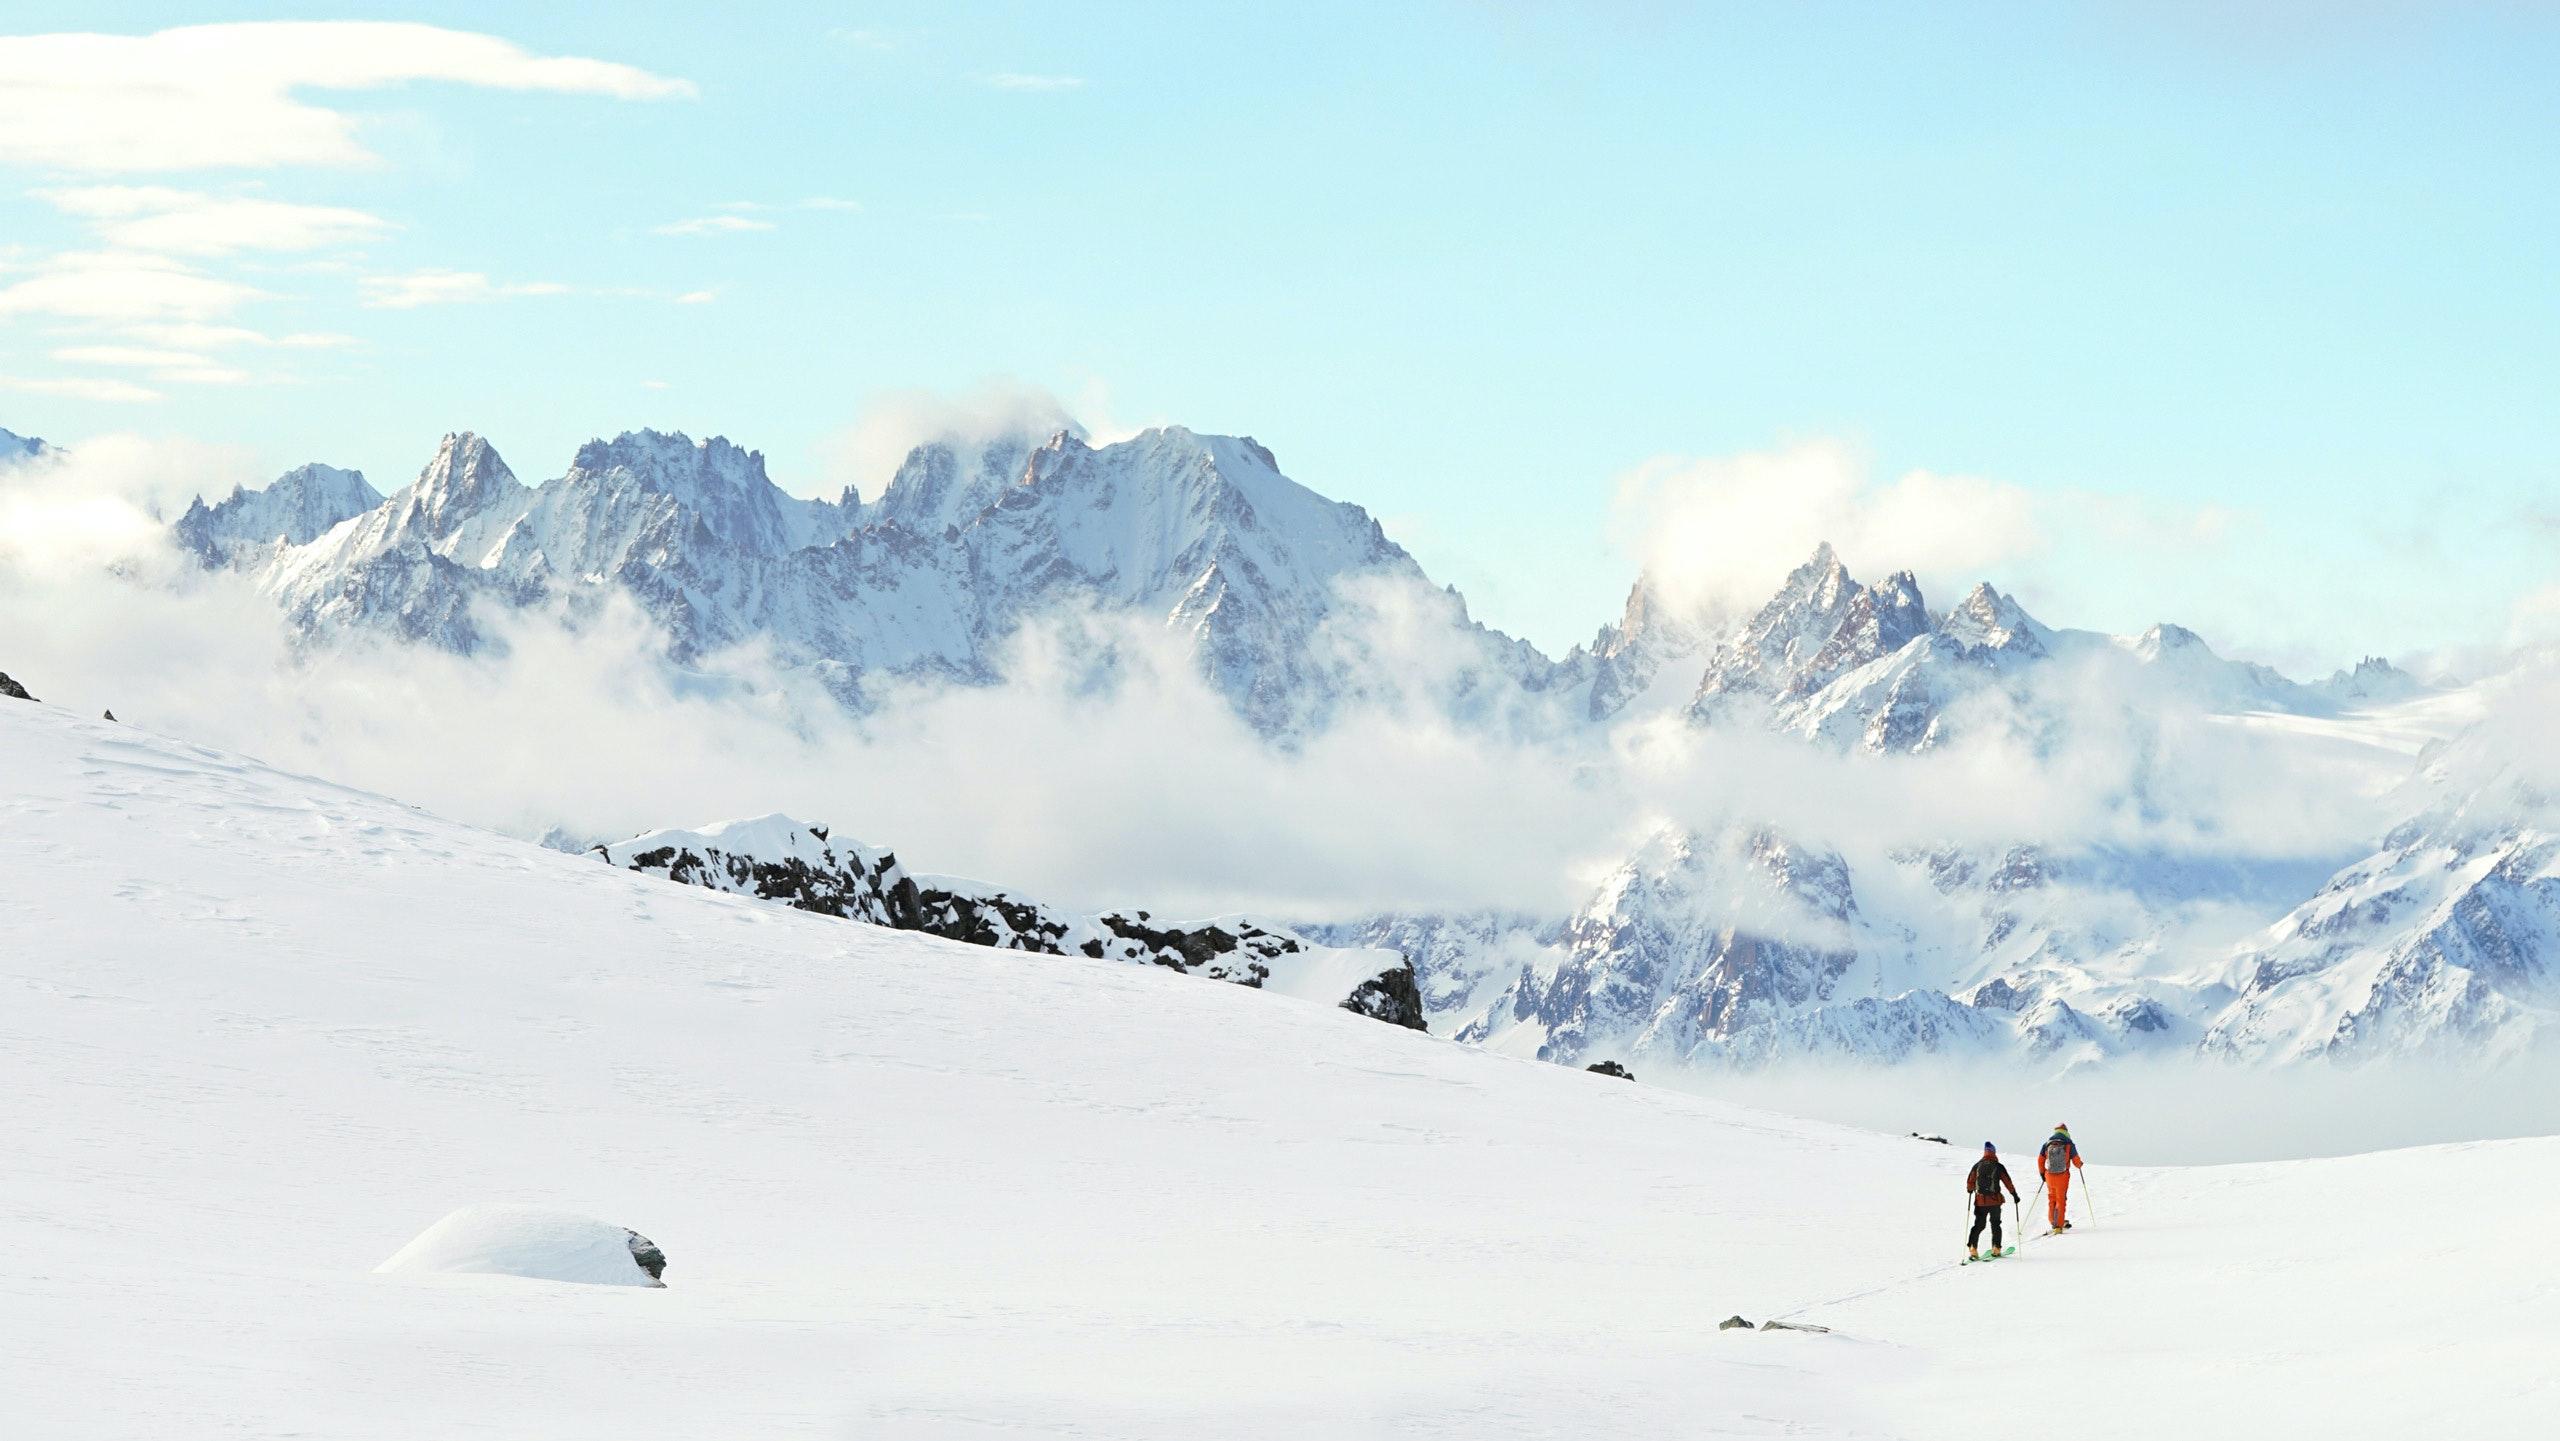 backcountry-touring-skis-2020-2021-RVK